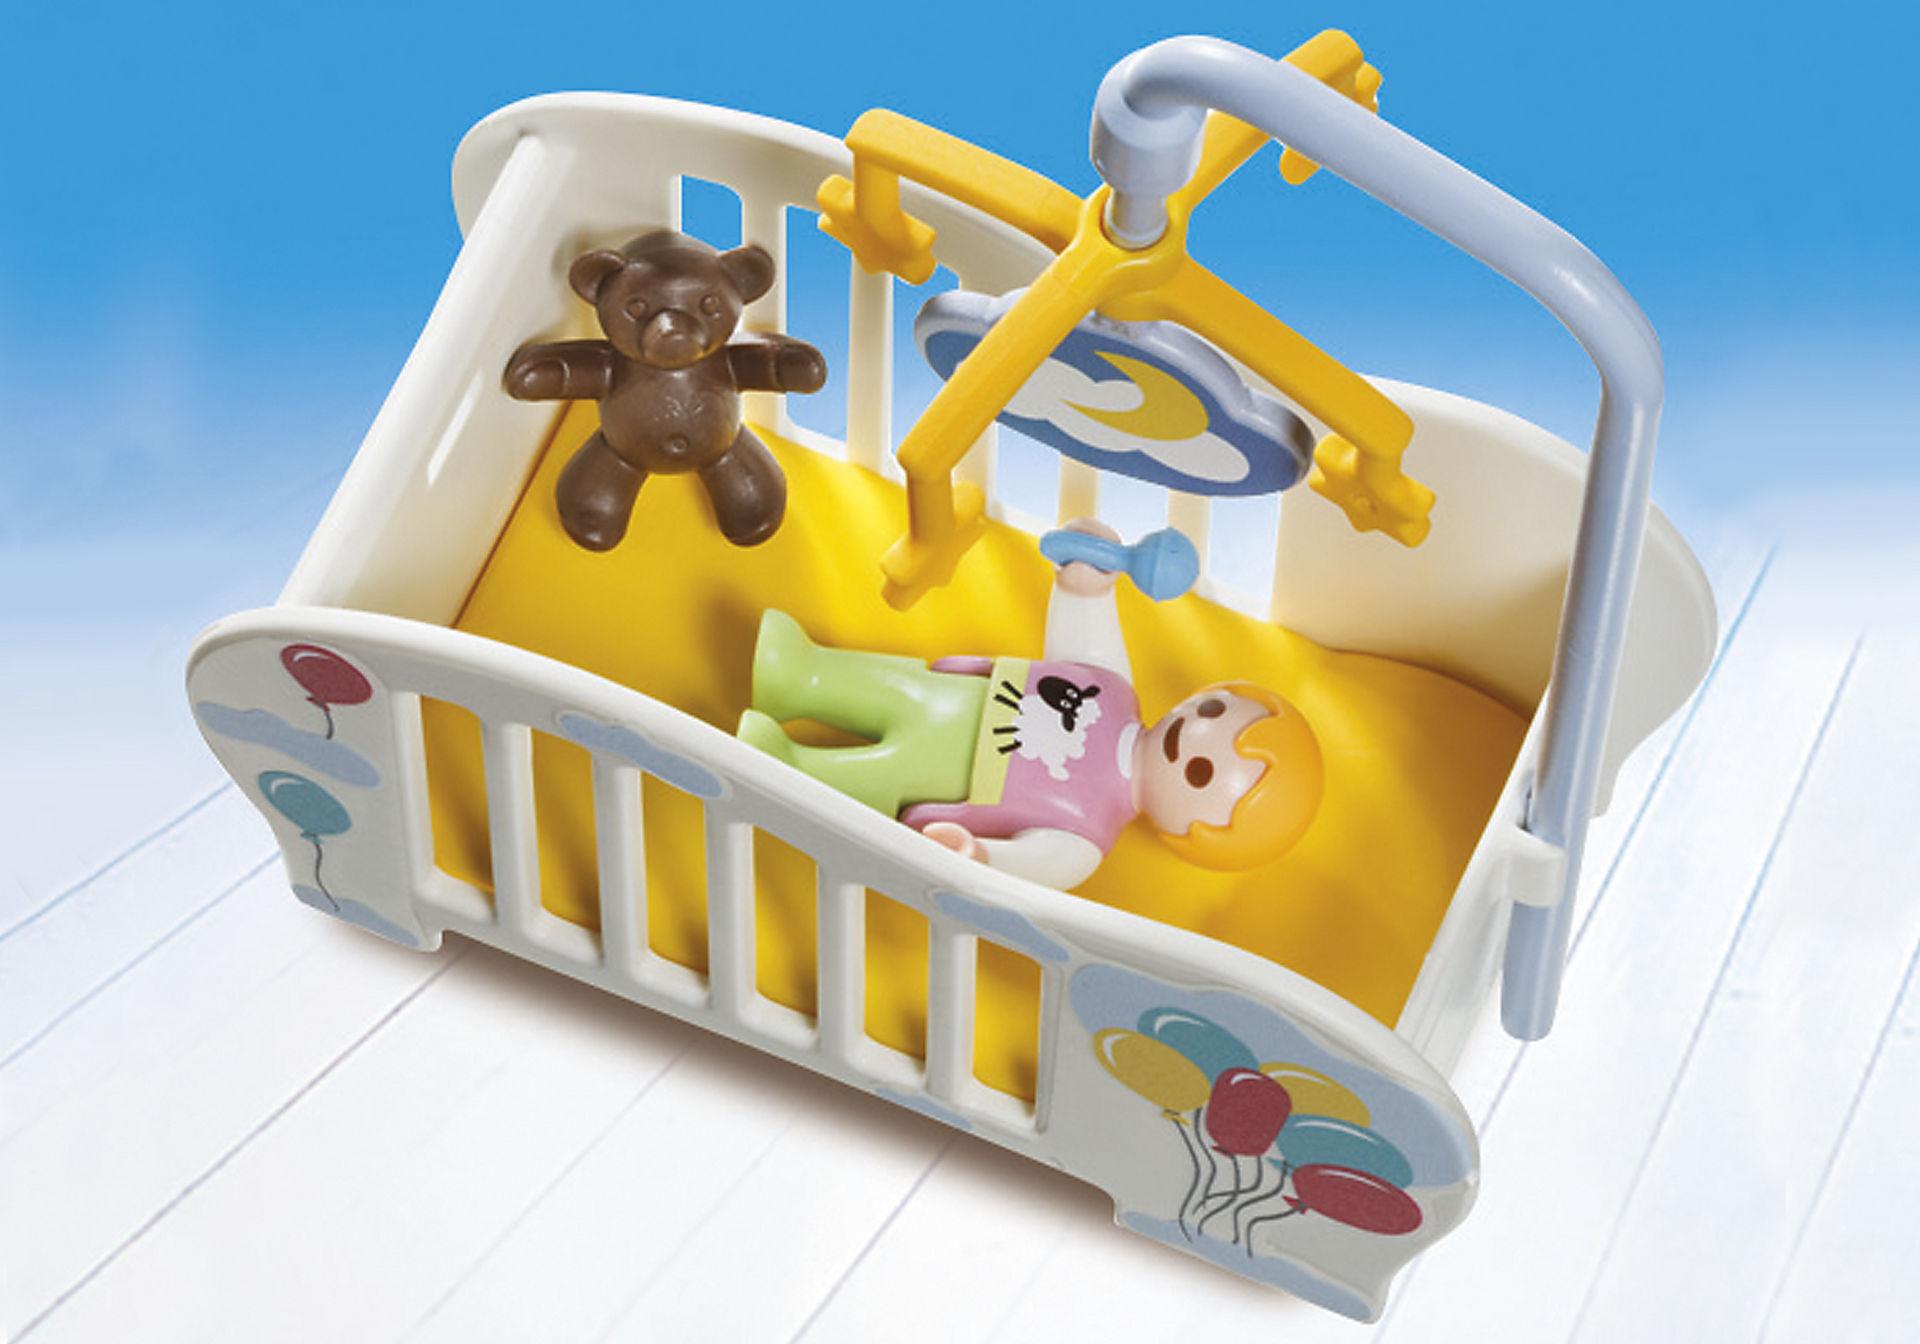 70531 Nursery Carry Case zoom image4